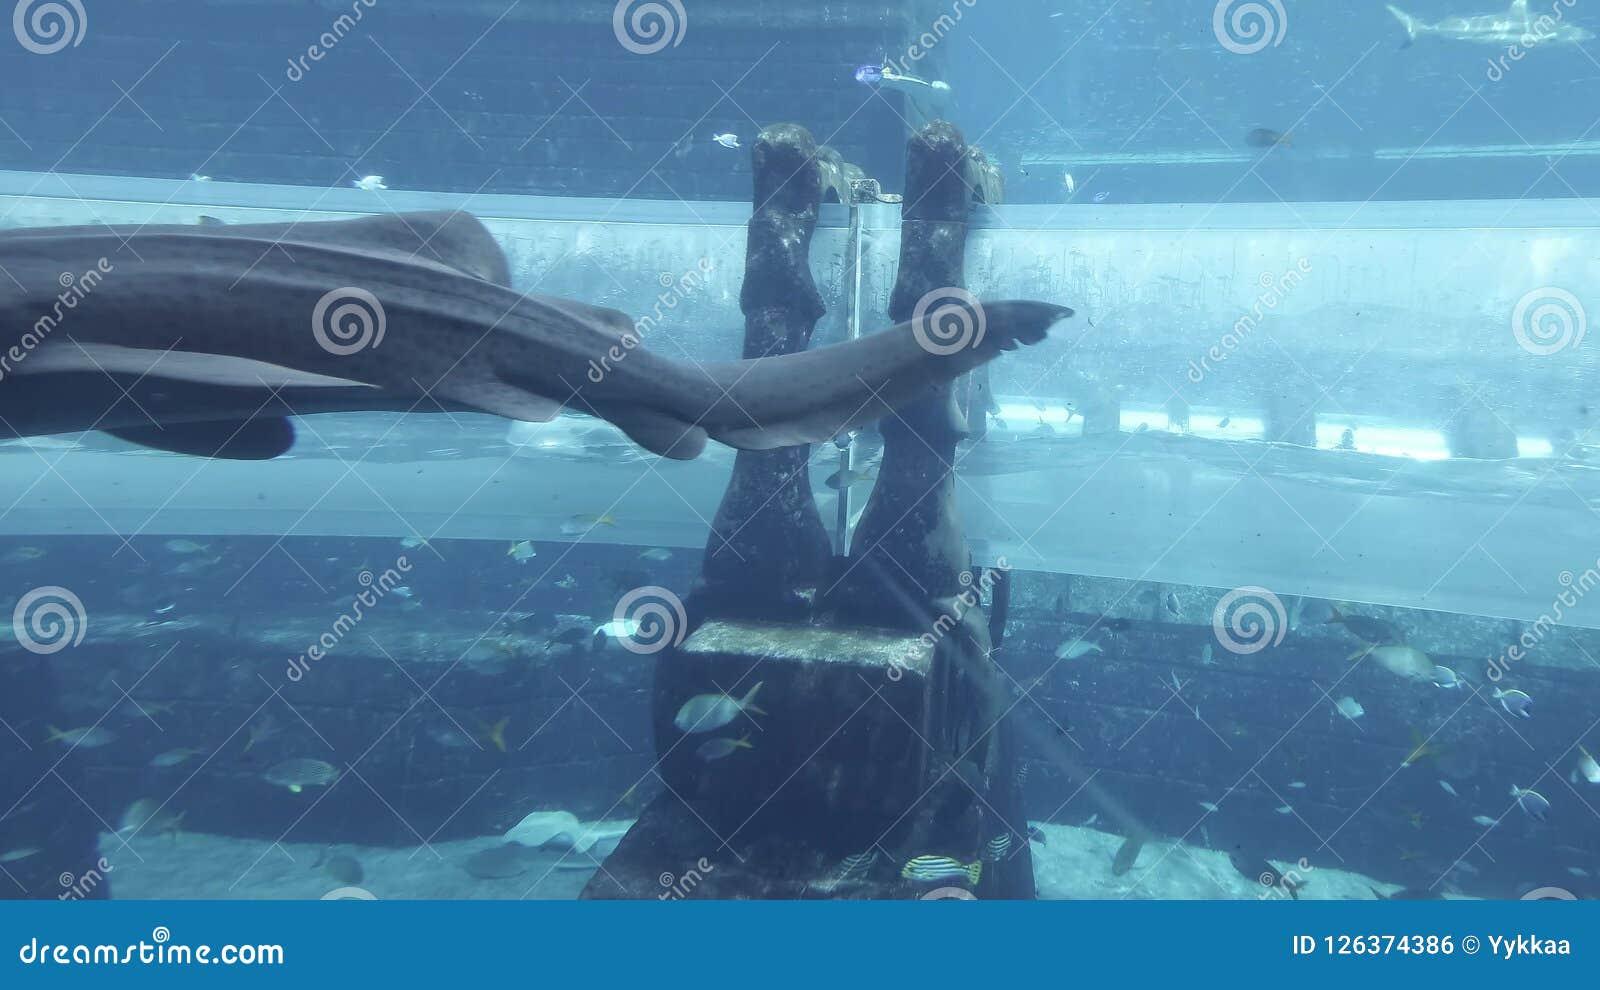 Marine aquarium with huge fish for the attraction Sharks Attack in the  aquapark Aquaventure in Atlantis Resort stock